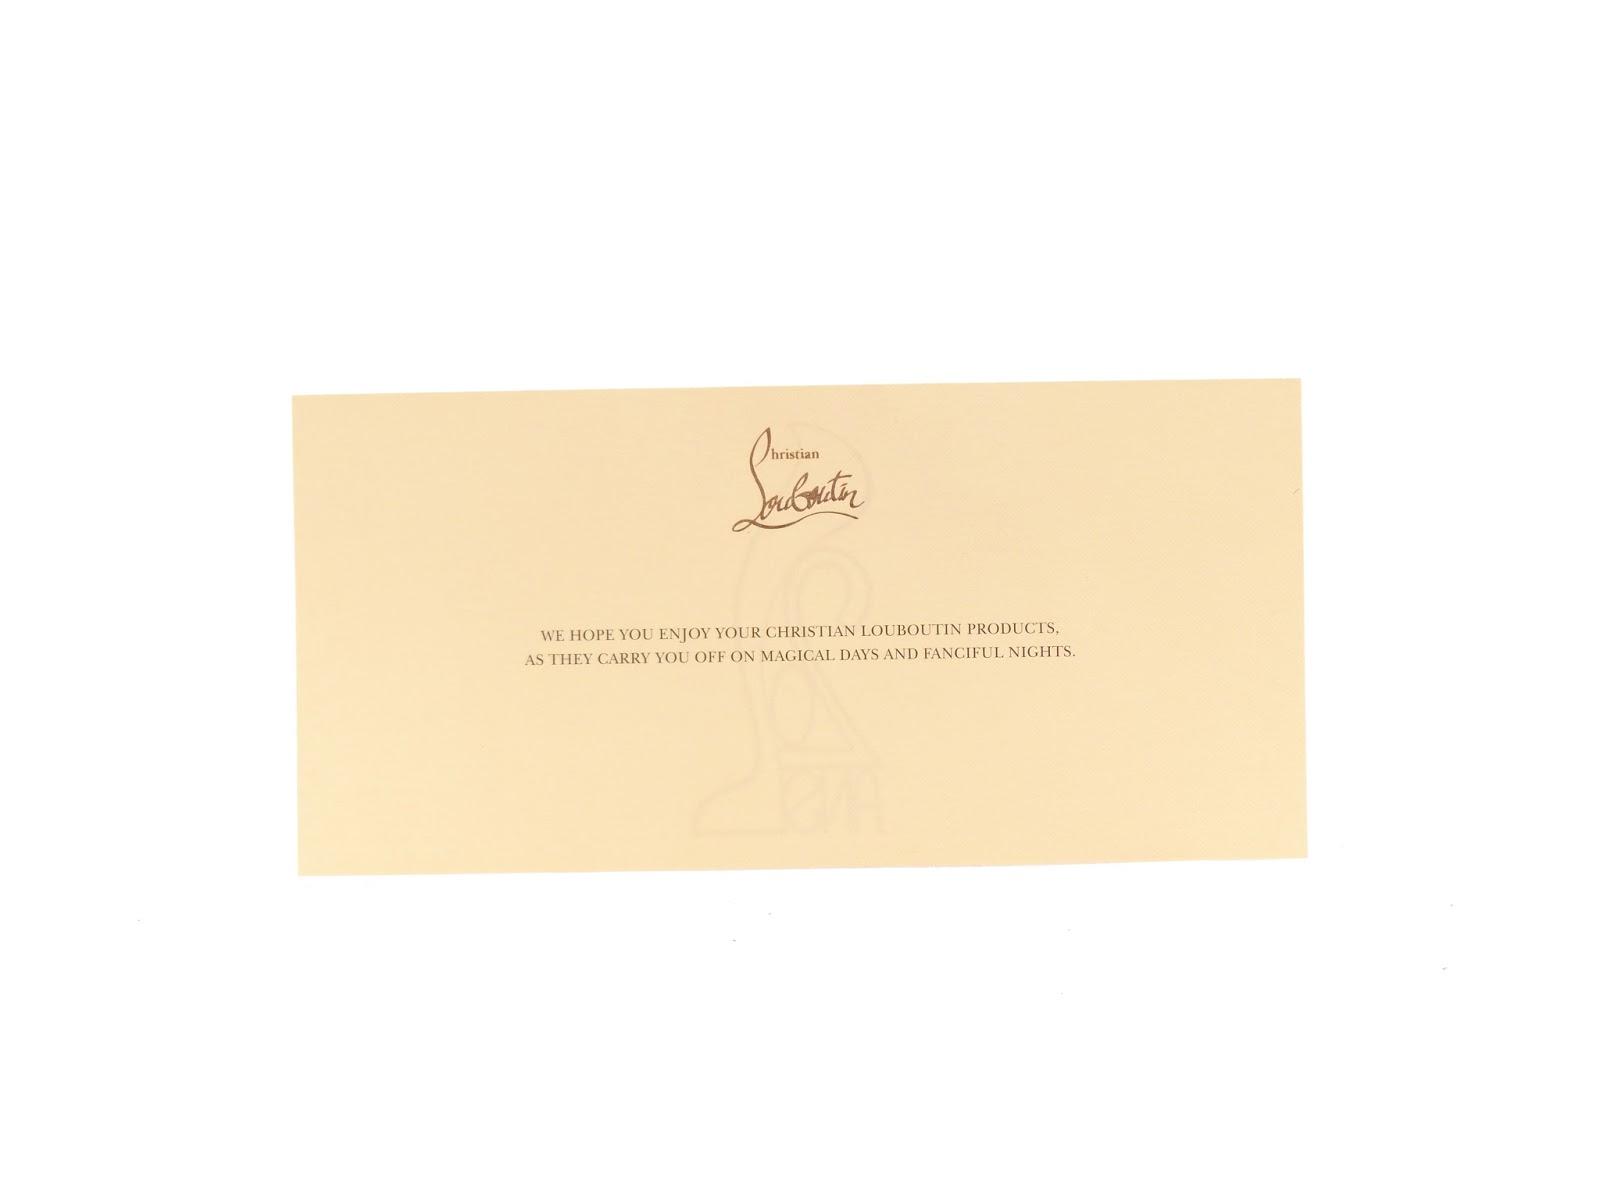 77ed2edfd9b CHRISTIAN LOUBOUTIN : AUTHENTICITY GUIDE - Reed Fashion Blog